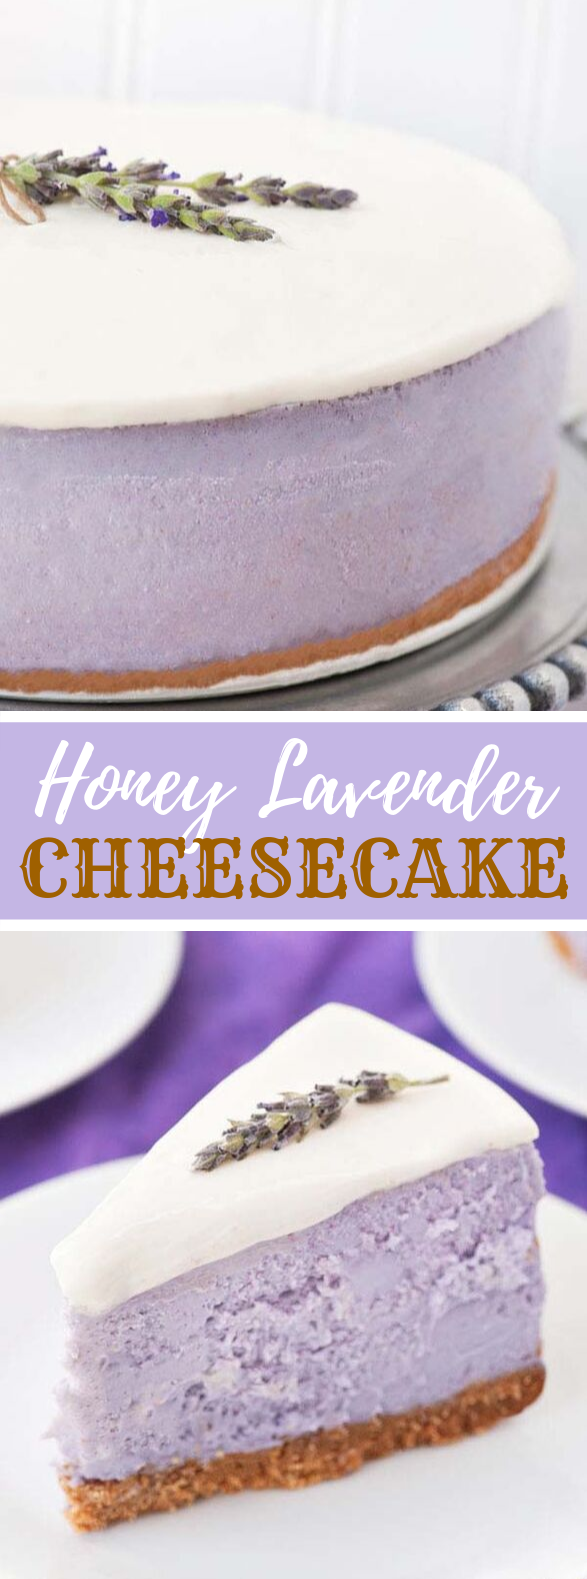 HONEY LAVENDER CHEESECAKE #desserts #cake